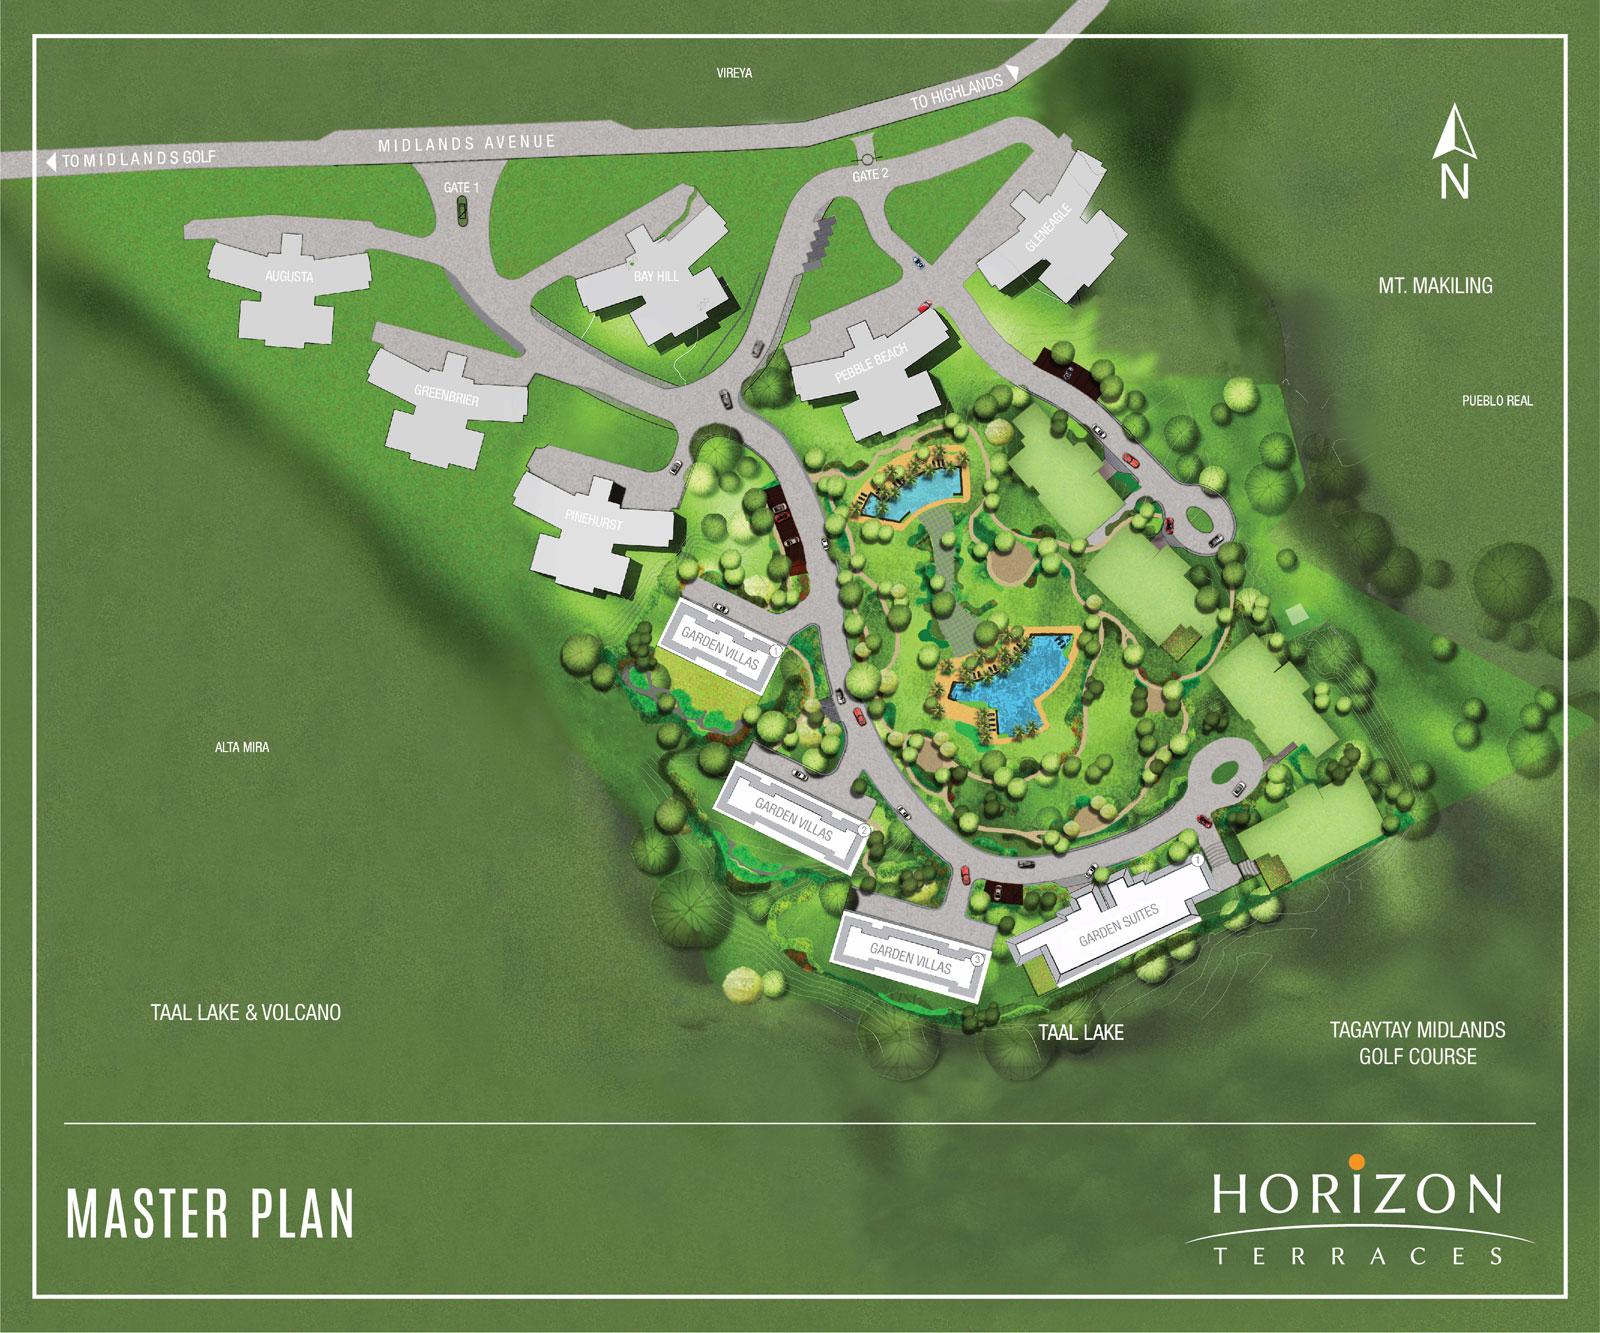 Horizon Terraces, Master Plan